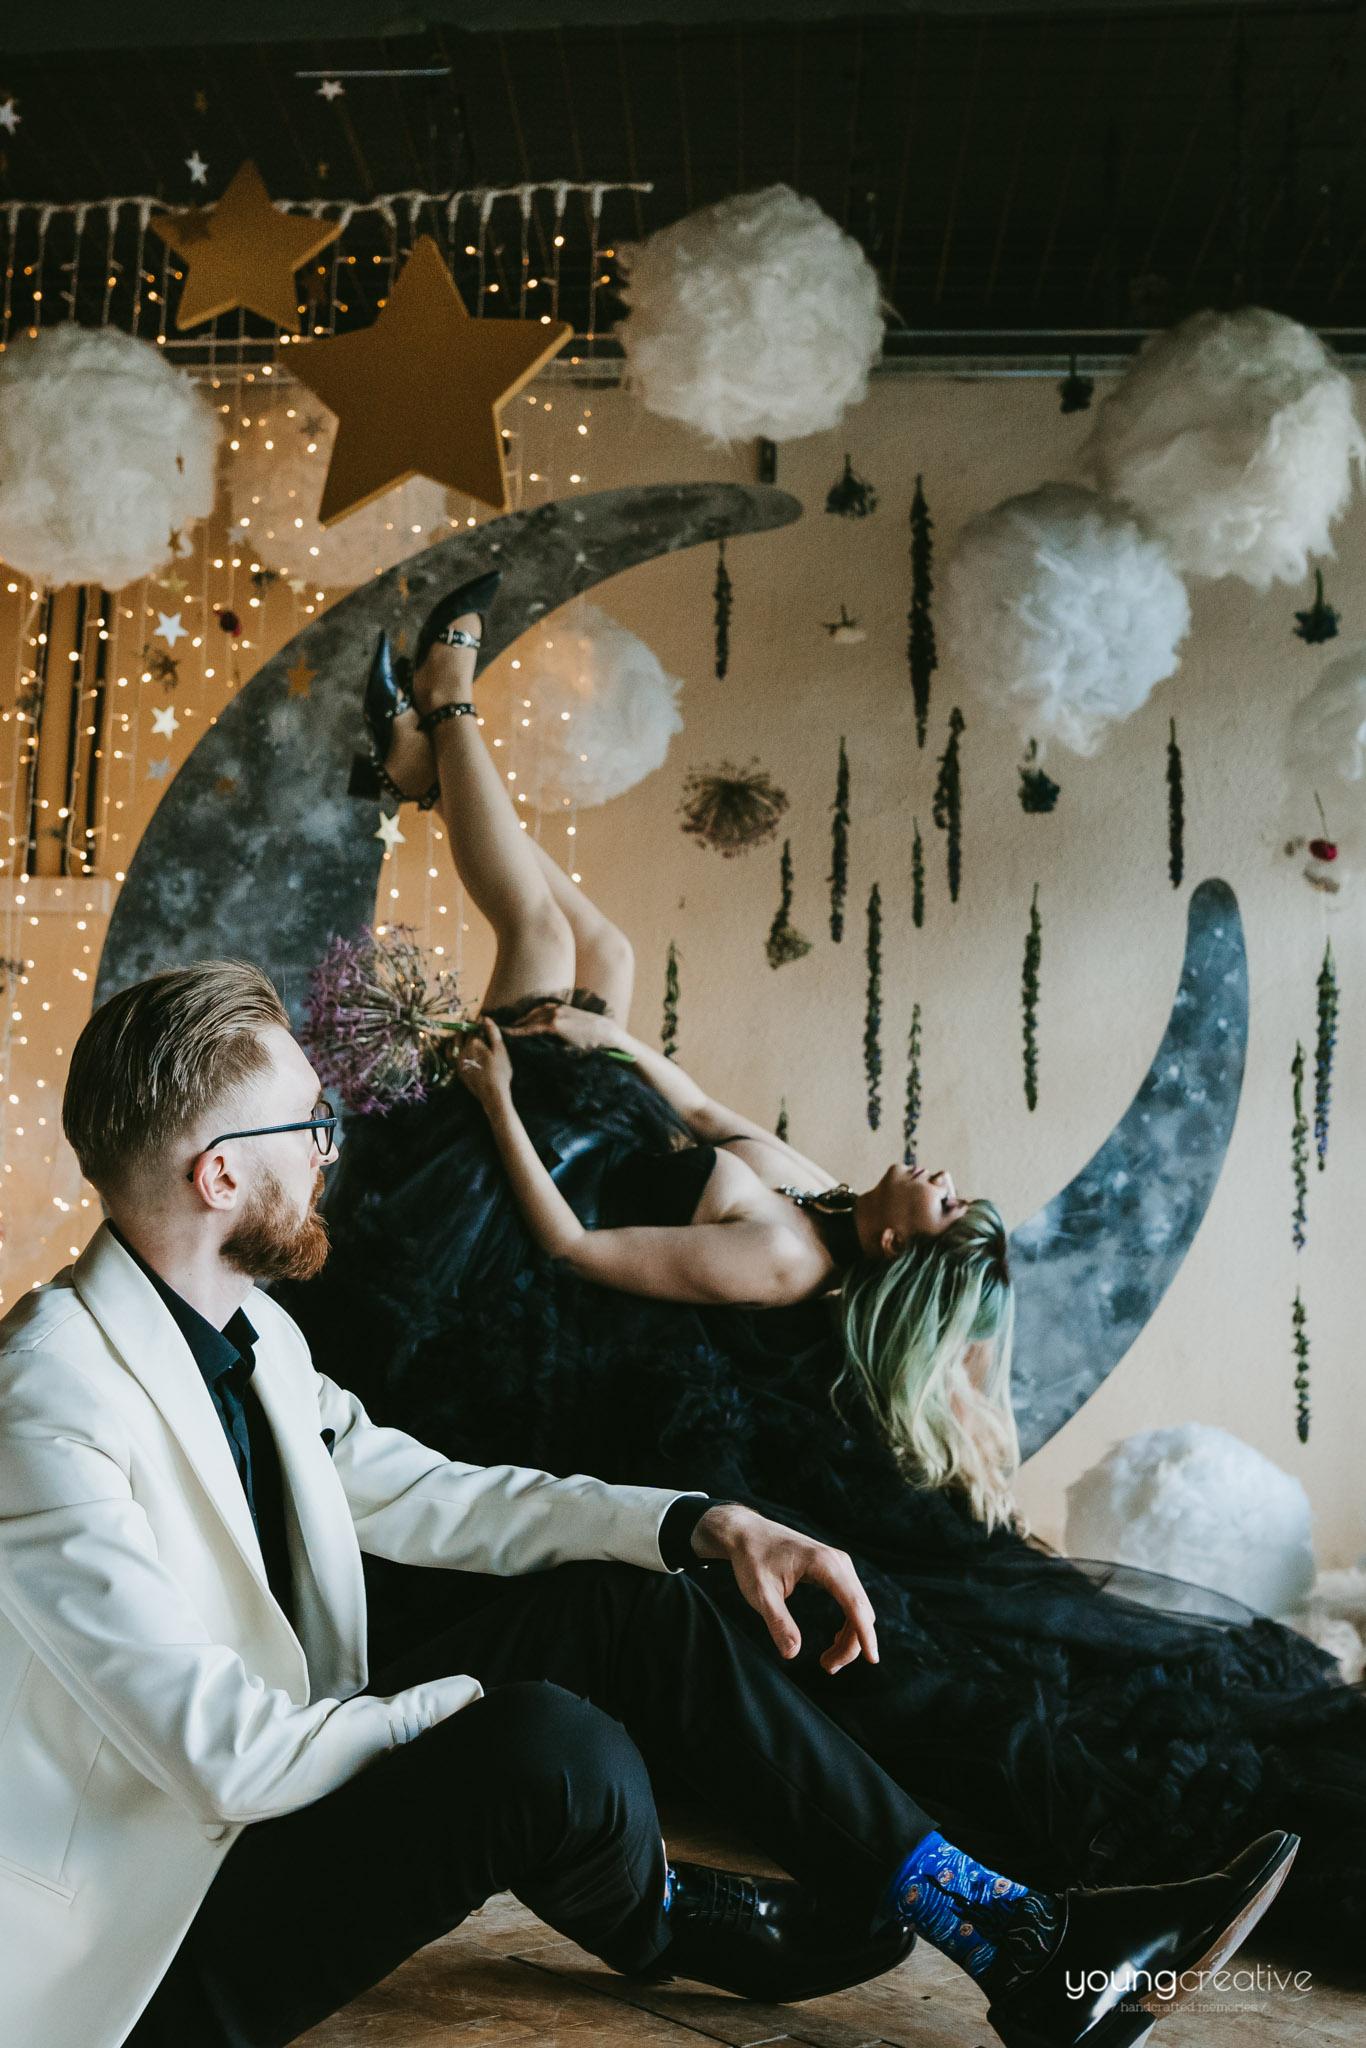 Duality. Day & Night | youngcreative.info media © Dan Filipciuc, Cristina Bejan | fotograf de destinatie, nunta